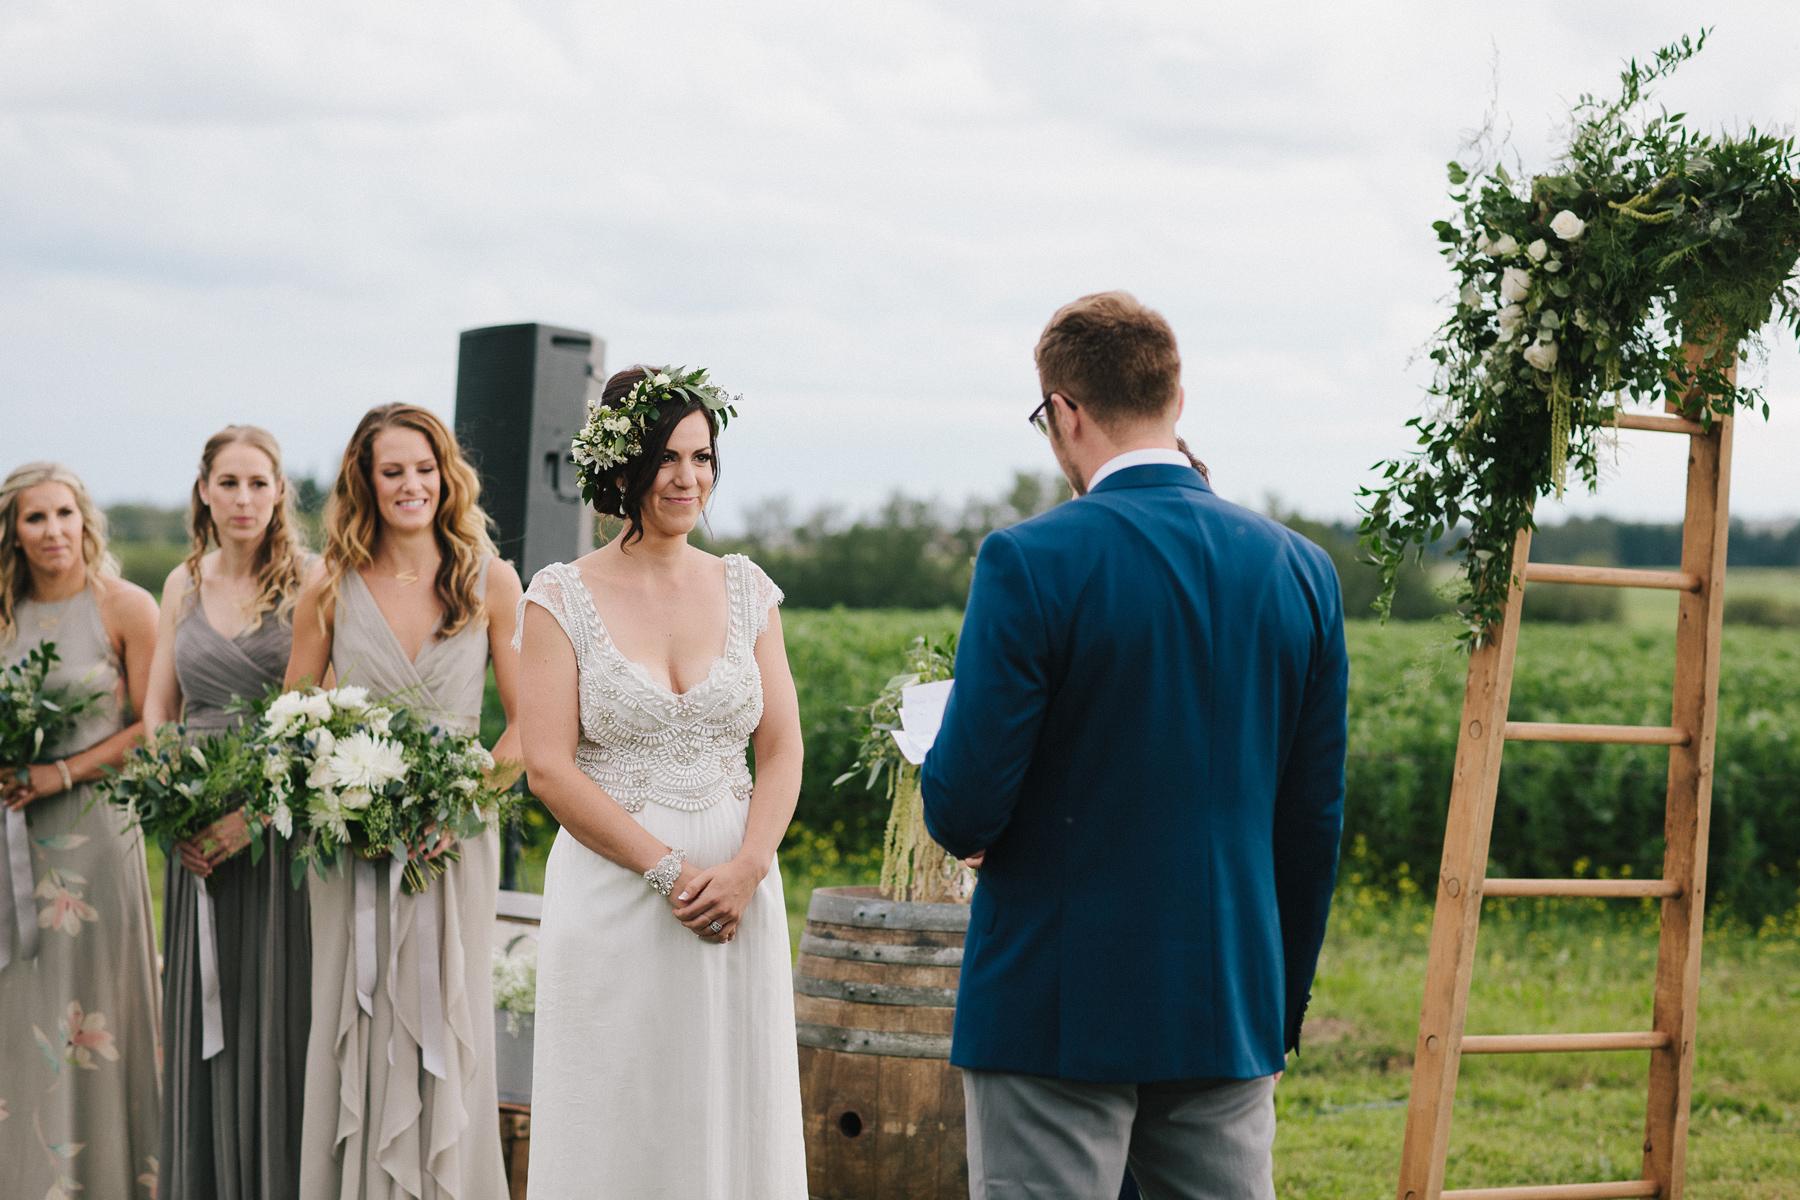 alberta-farm-wedding-photographer-rp-wj-120.jpg